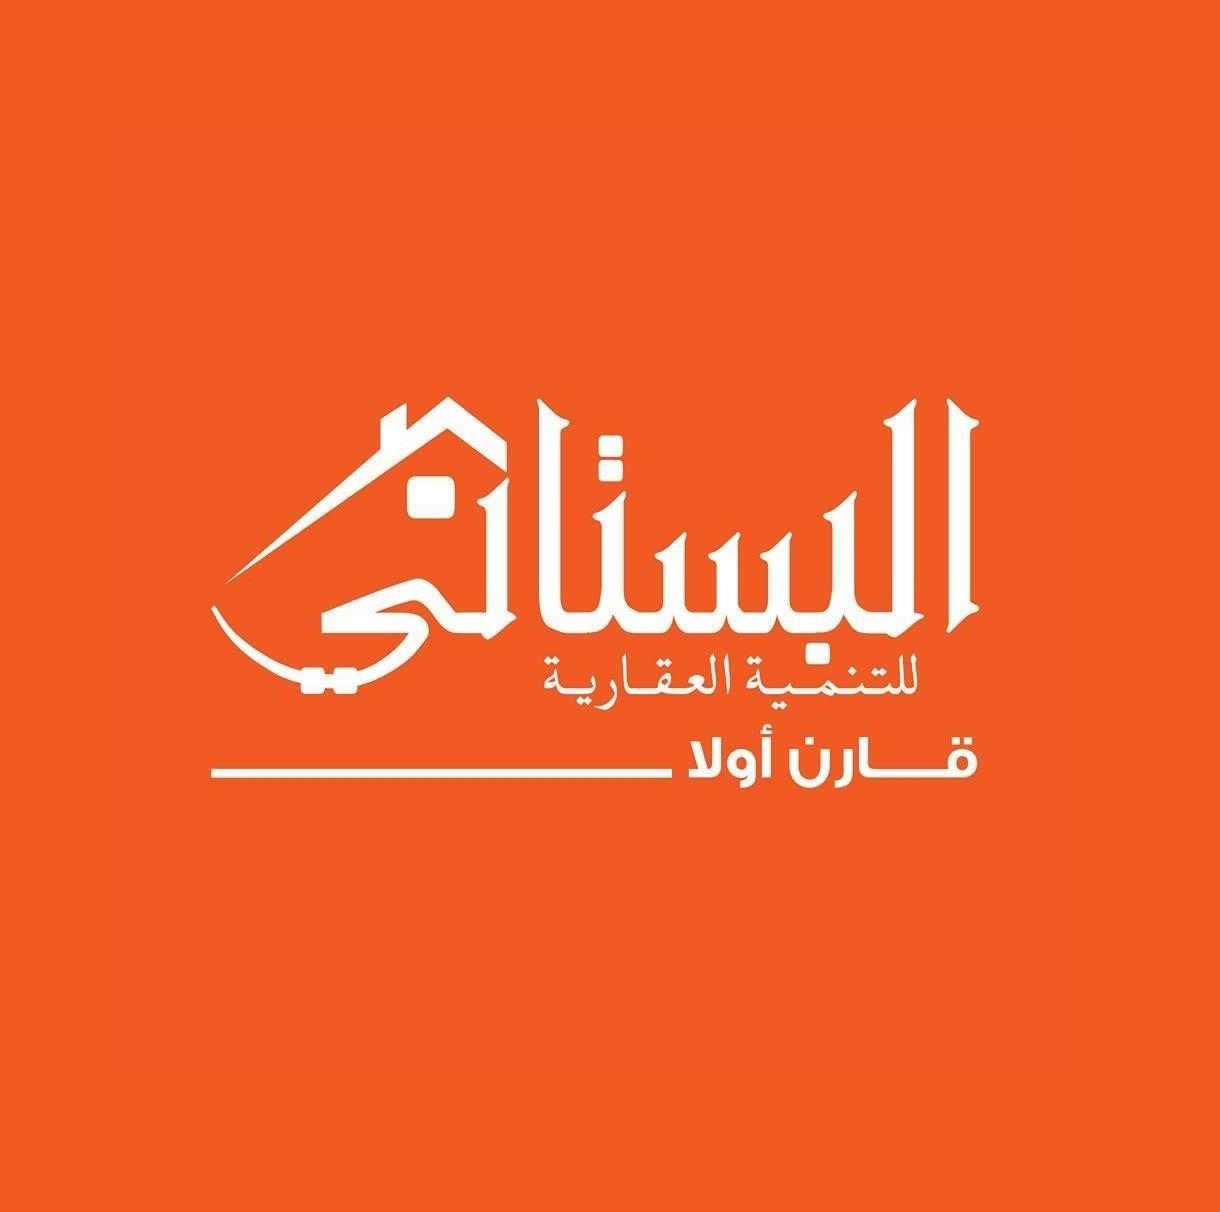 Al-Bostany Group